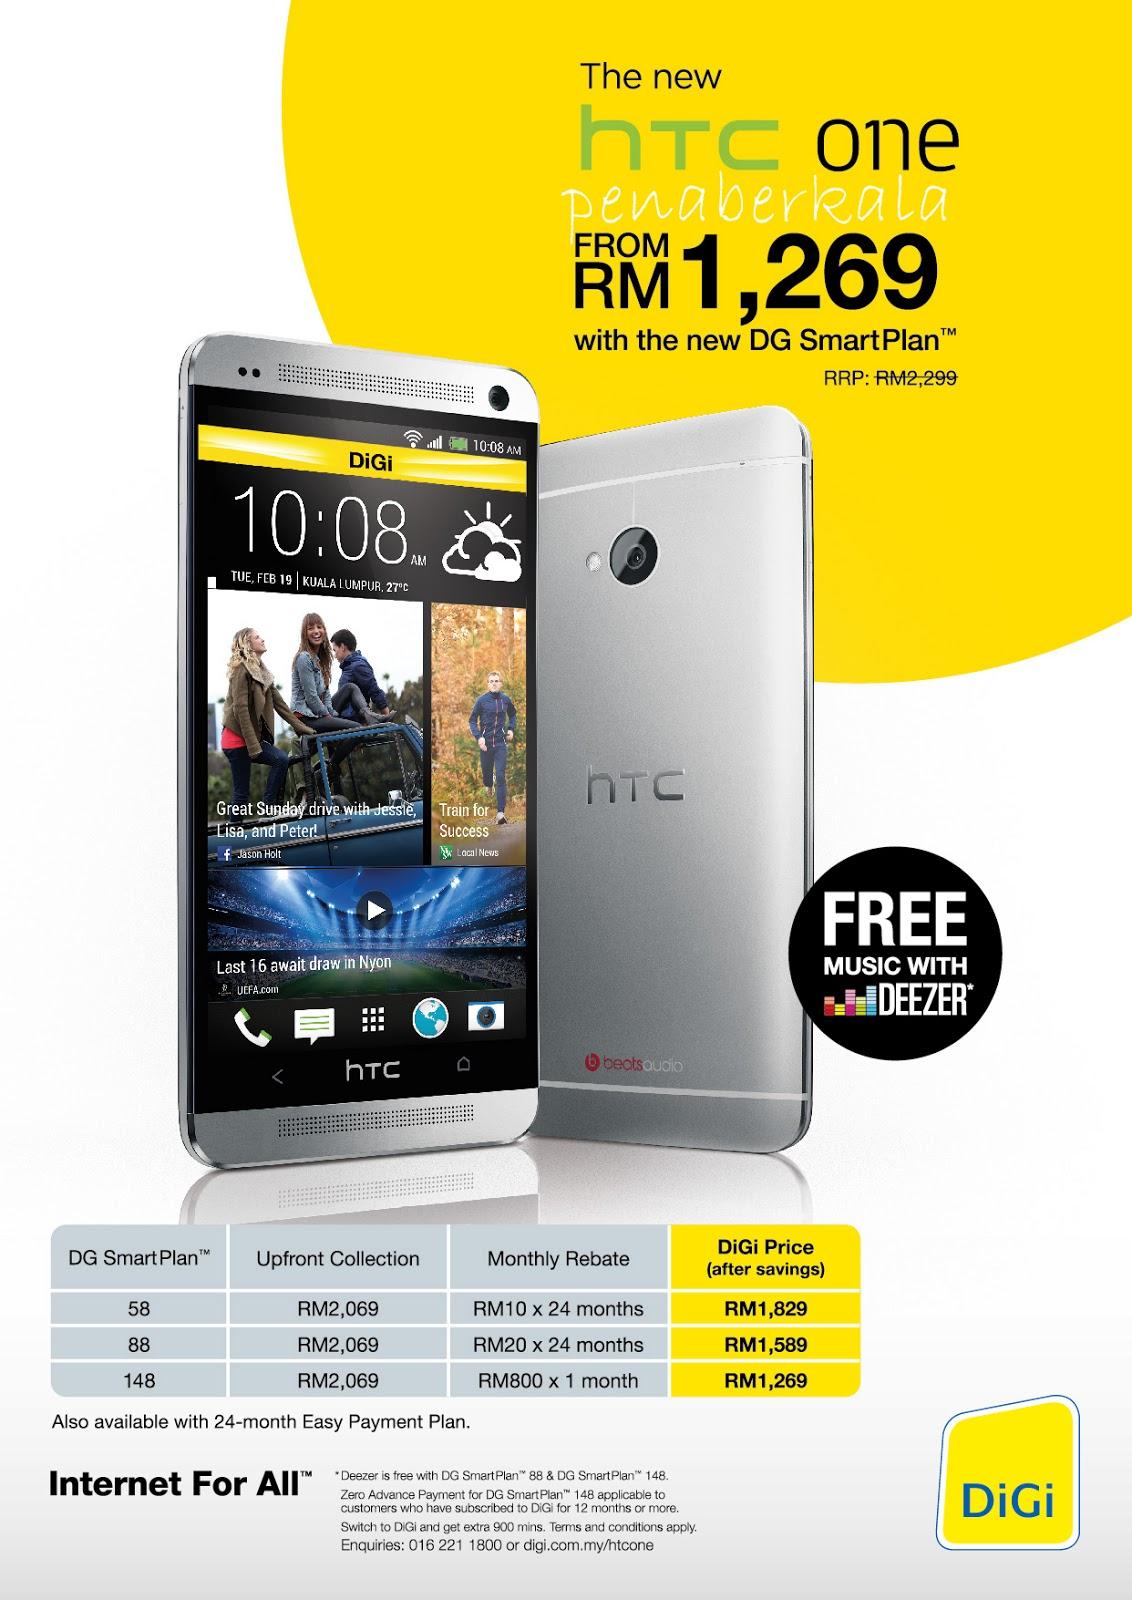 VISIBLE VOICE SAMSUNG GALAXY S4 ATAU HTC ONE